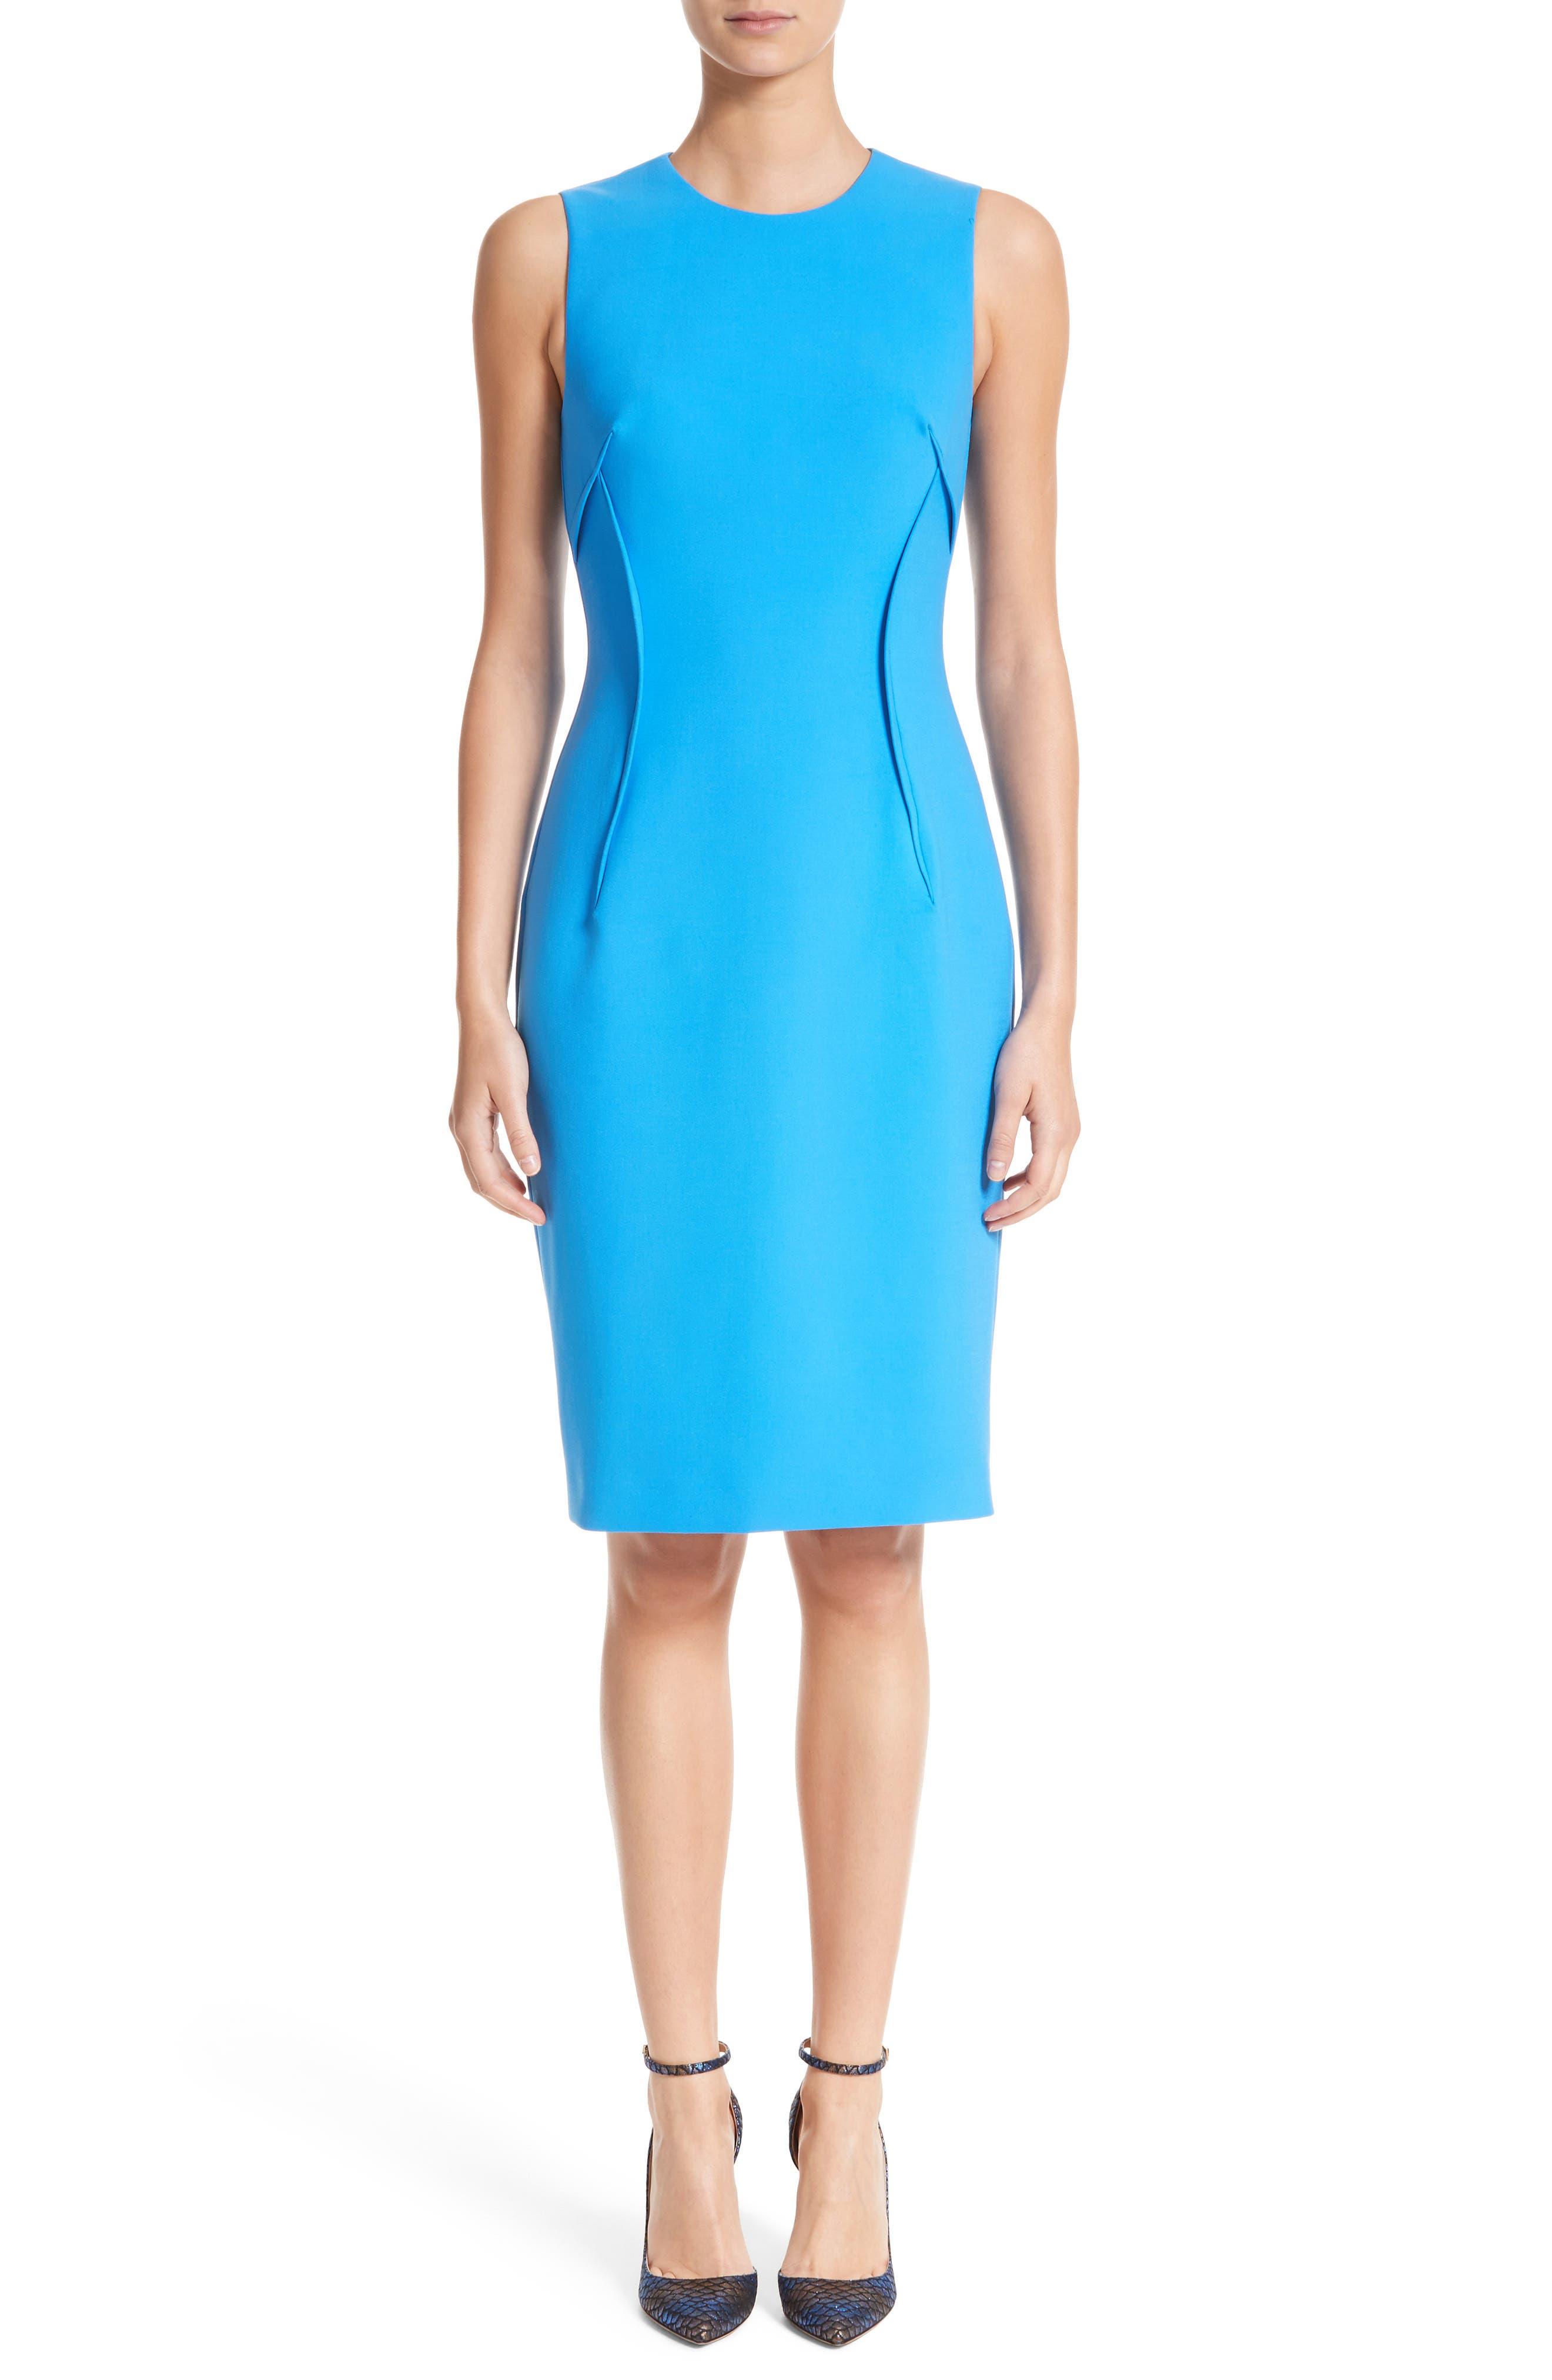 VERSACE COLLECTION, Stretch Cady Sheath Dress, Alternate thumbnail 5, color, BLACK